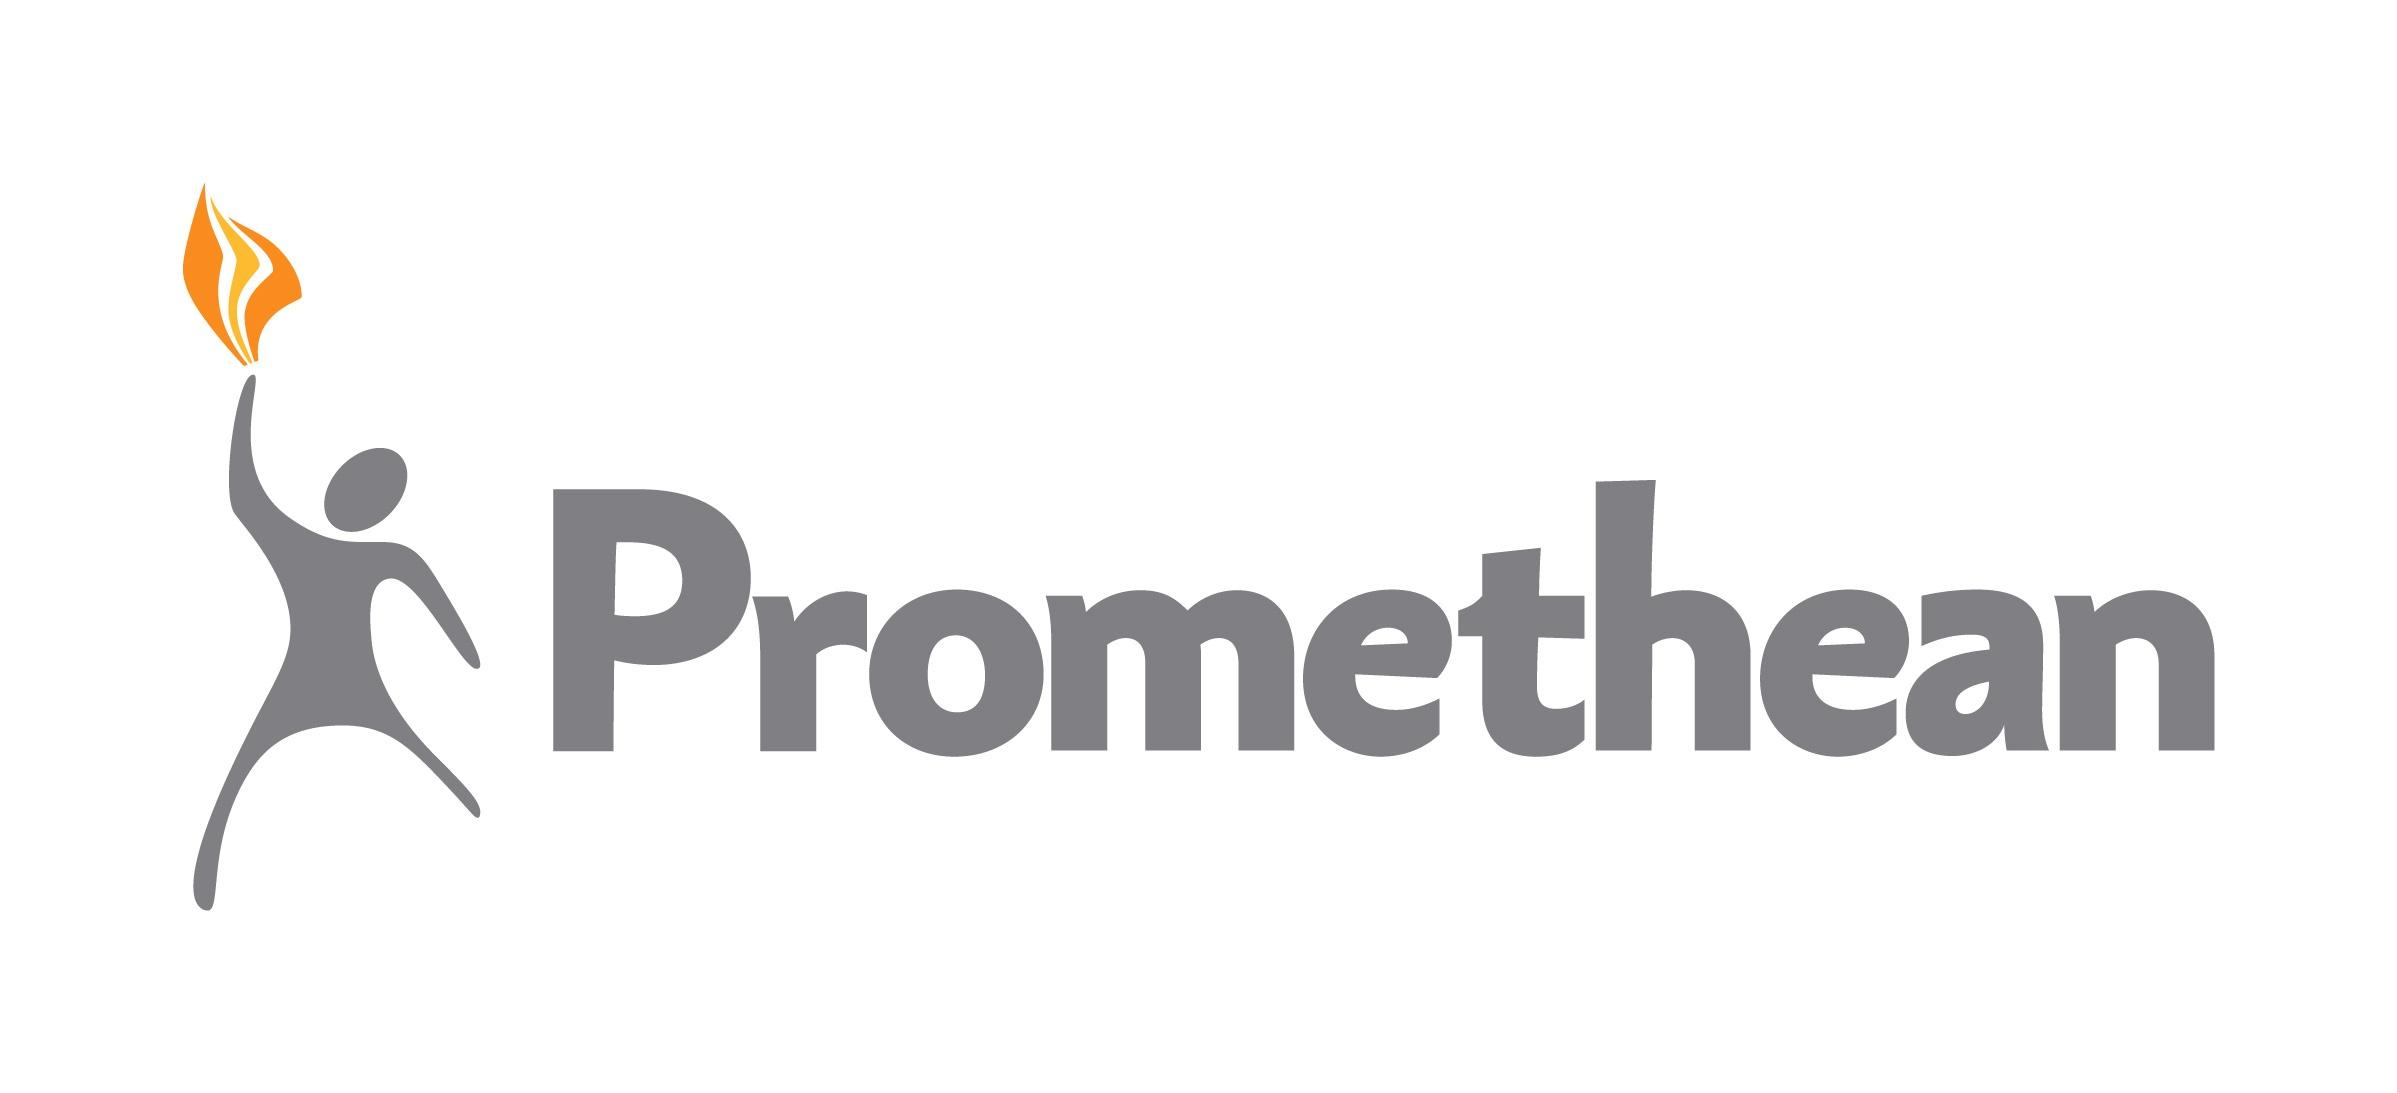 University of Florida Teams with Global Education Technology Company Promethean on Leadership Development Program for Colorado Educators